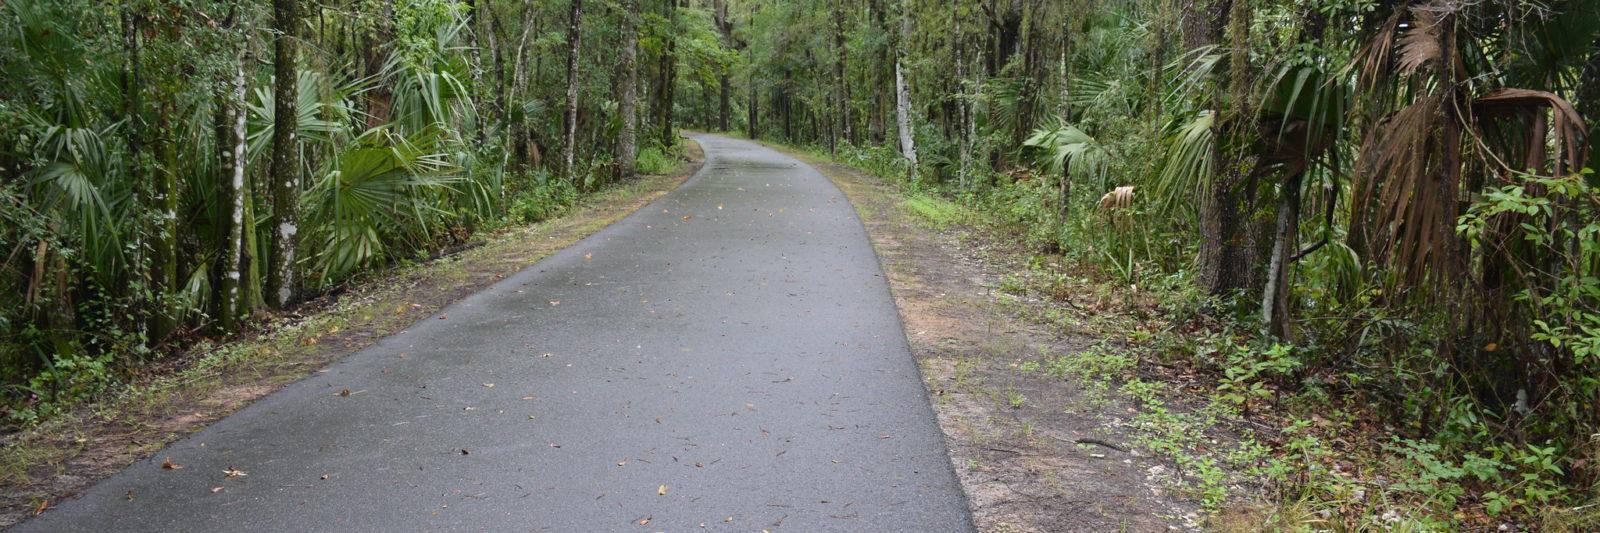 Florida Trail blaze on Dunnellon Trail